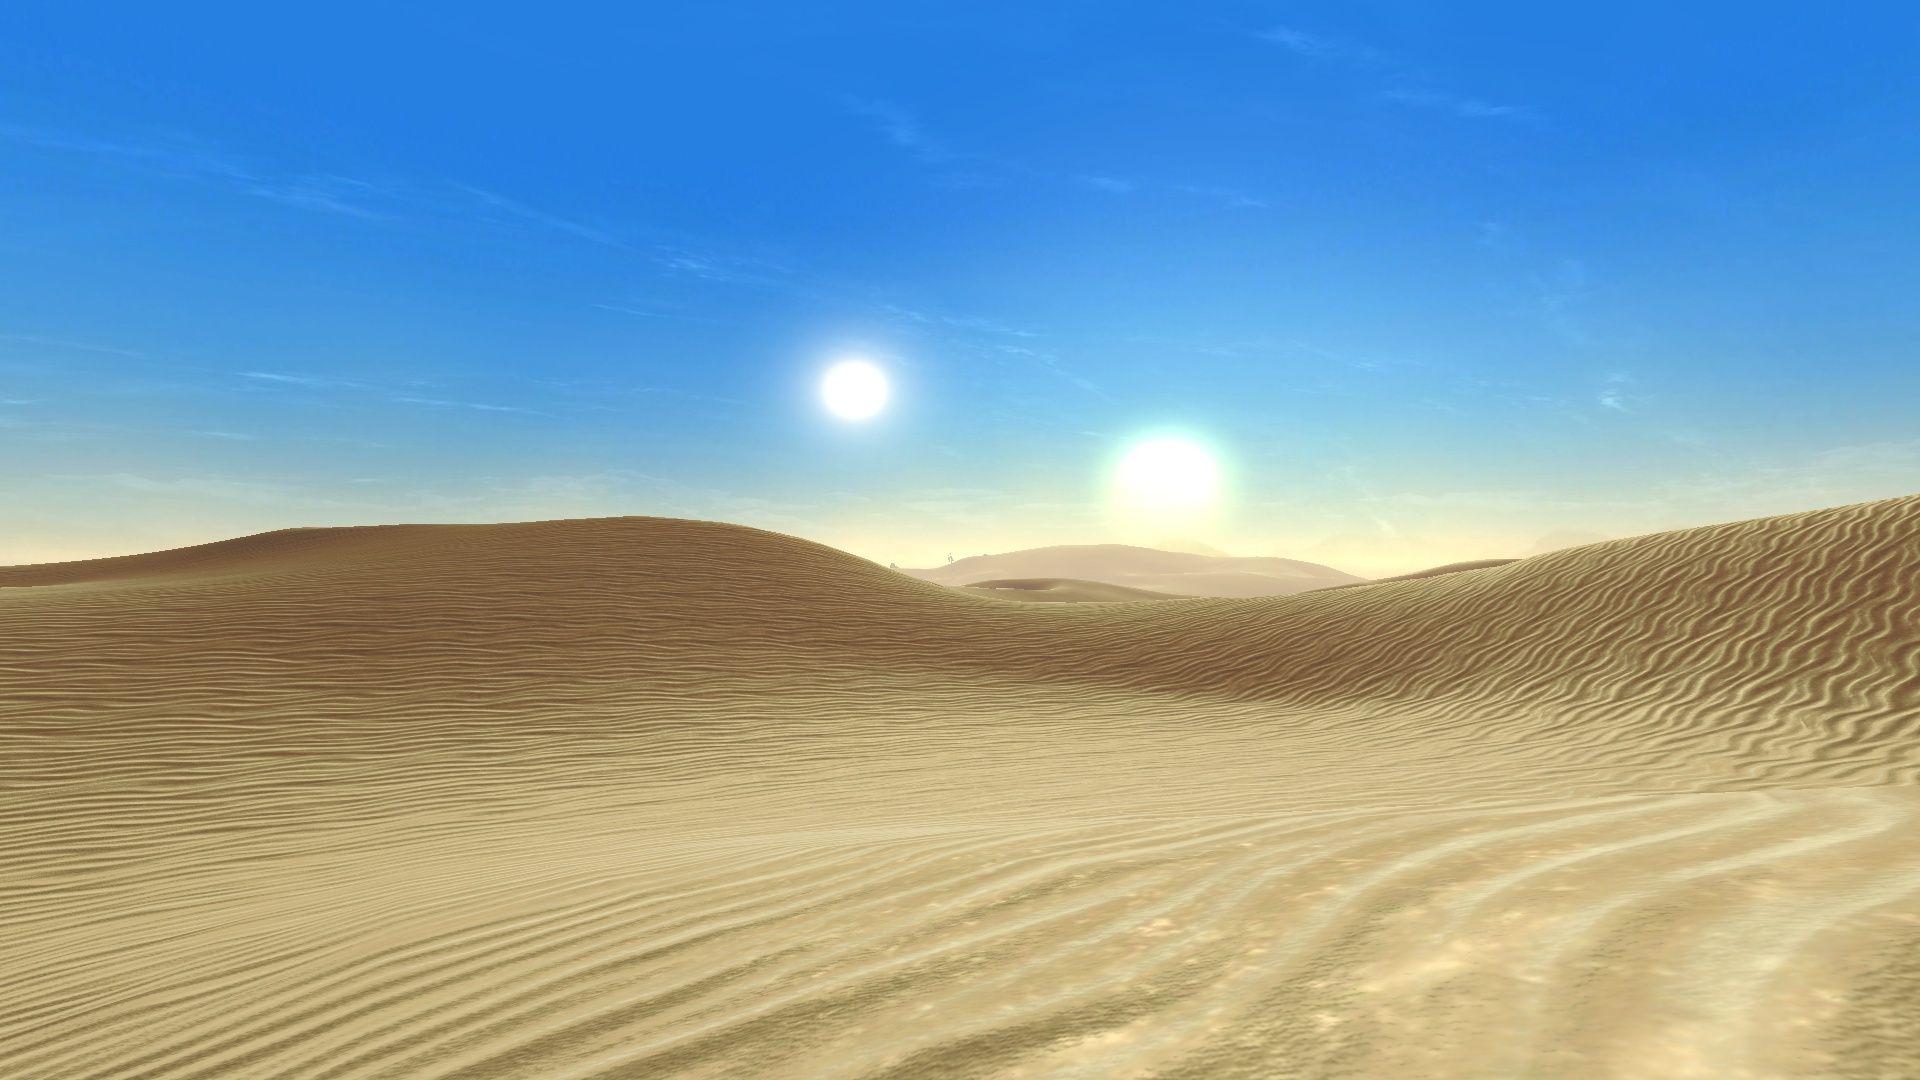 Tatooine Twin Suns Wallpaper Star Wars Earth Star Wars Boys Room